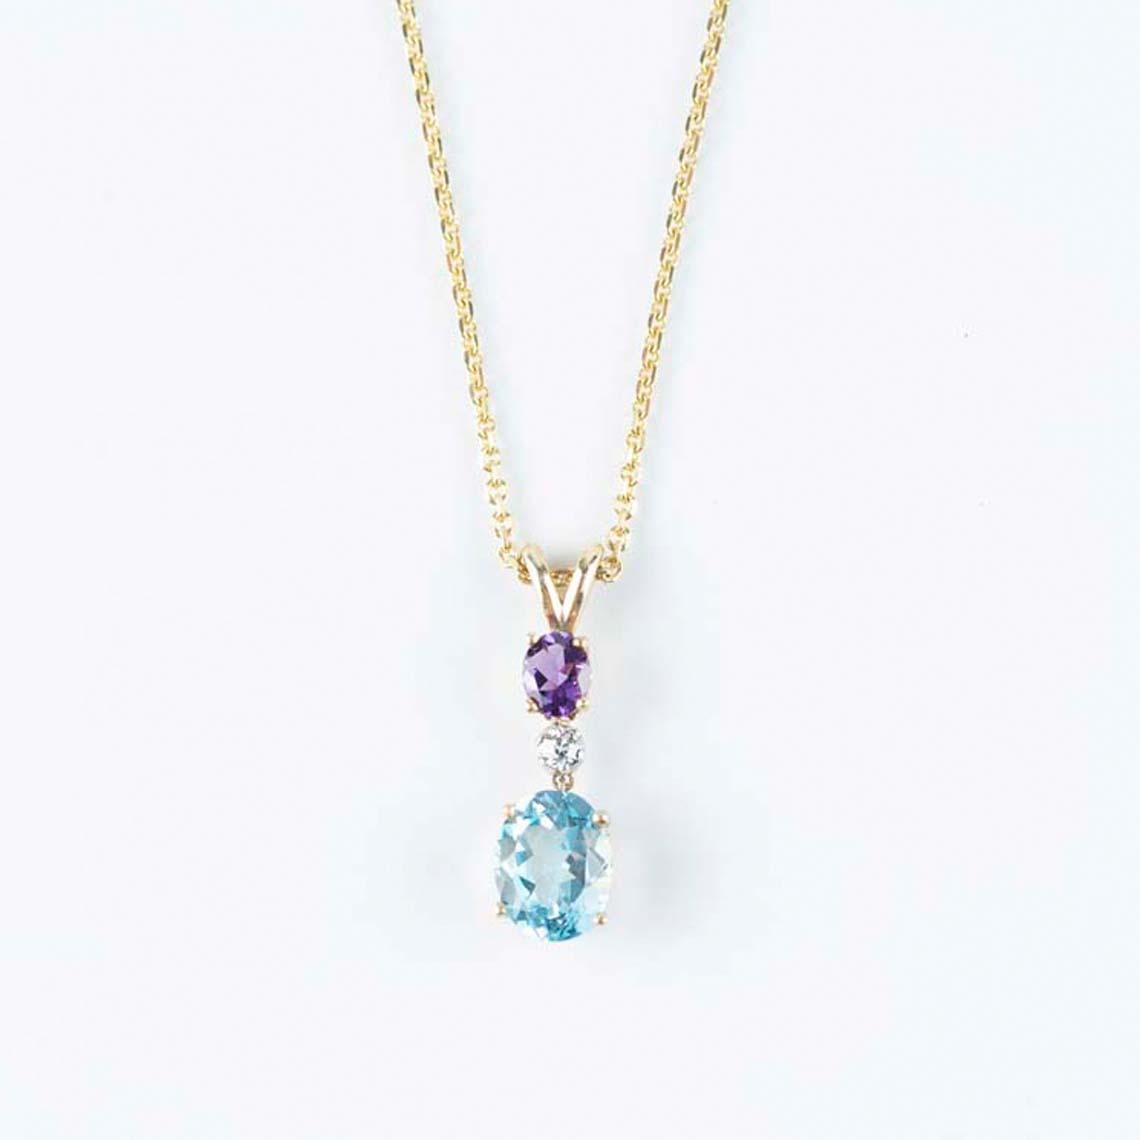 Topaz, amethyst and diamond pendant